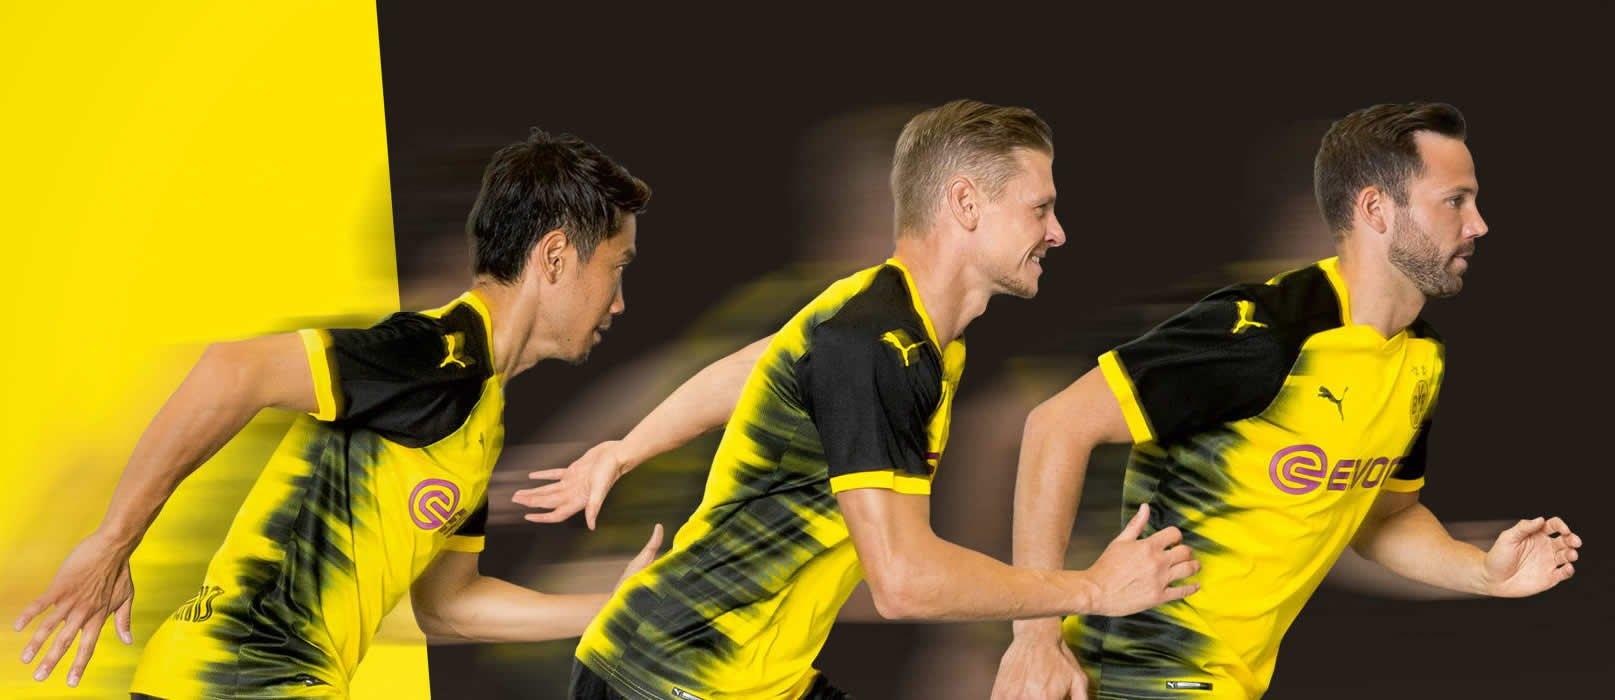 bayern trikot champions league 2019/19